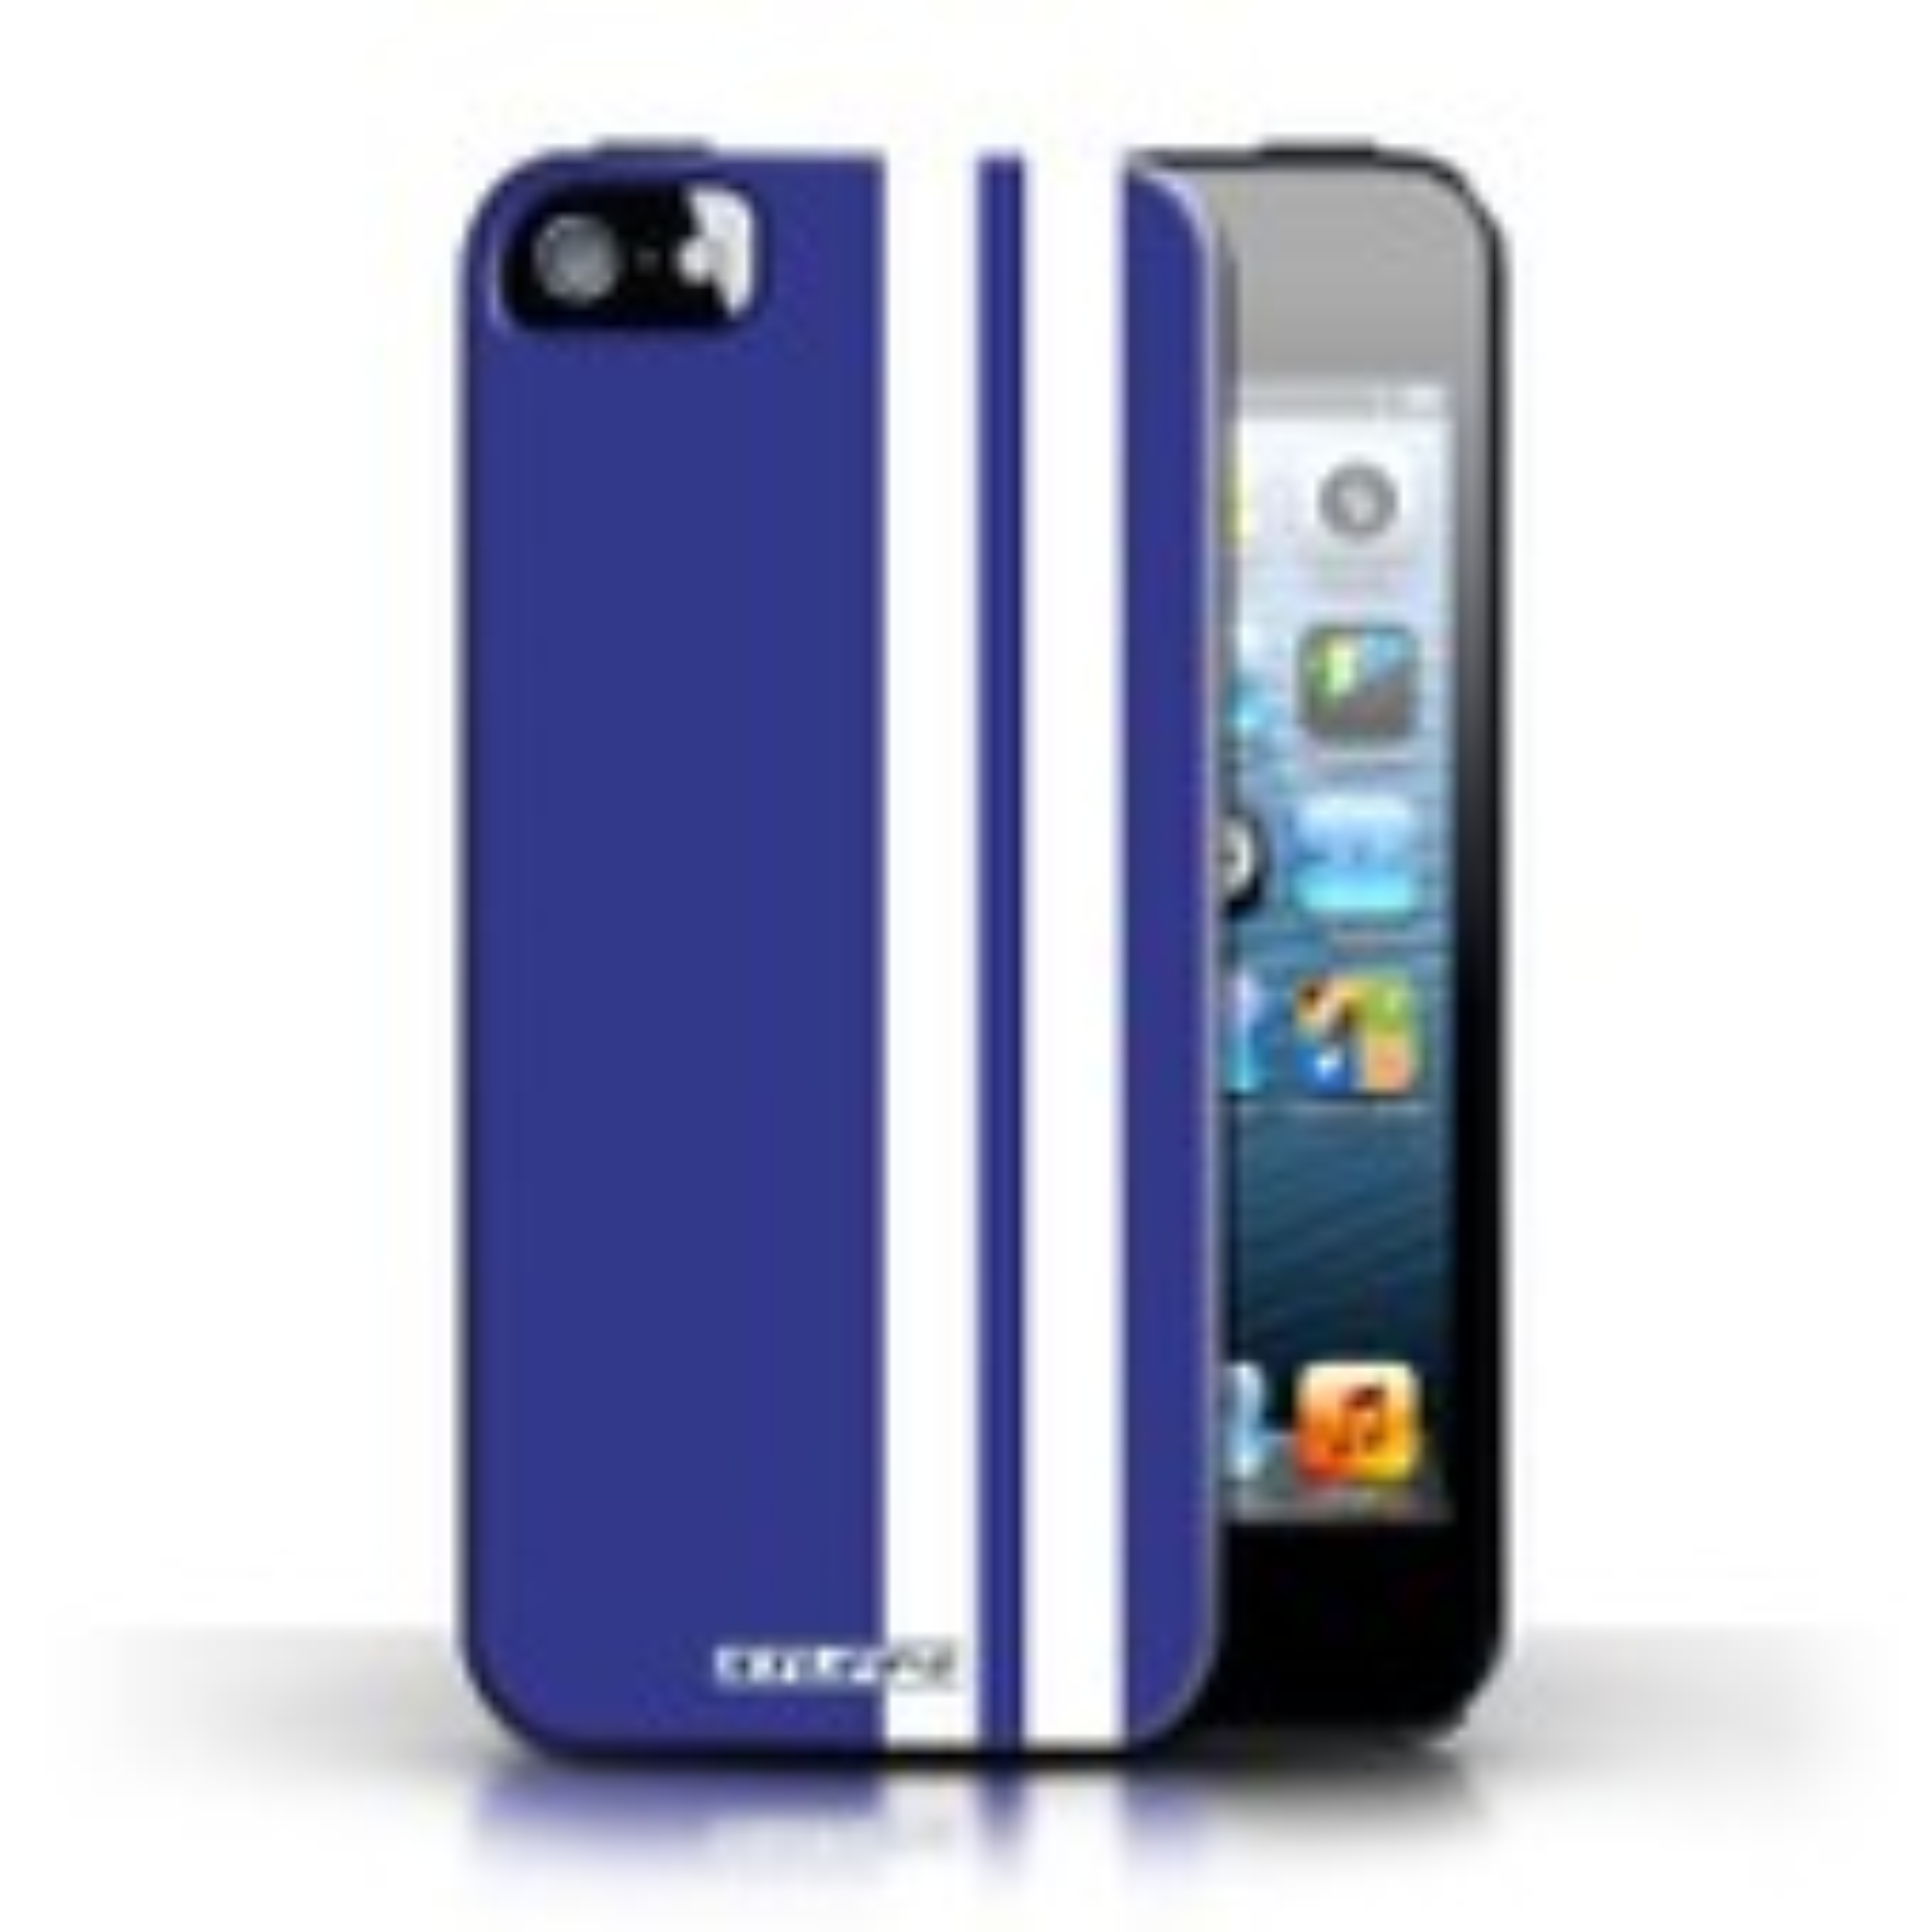 Coque De Stuff4 / Coque/Etui/Housse Pour Apple Iphone 5/5s / Gordini Design / Rayures Voiture Course Collection